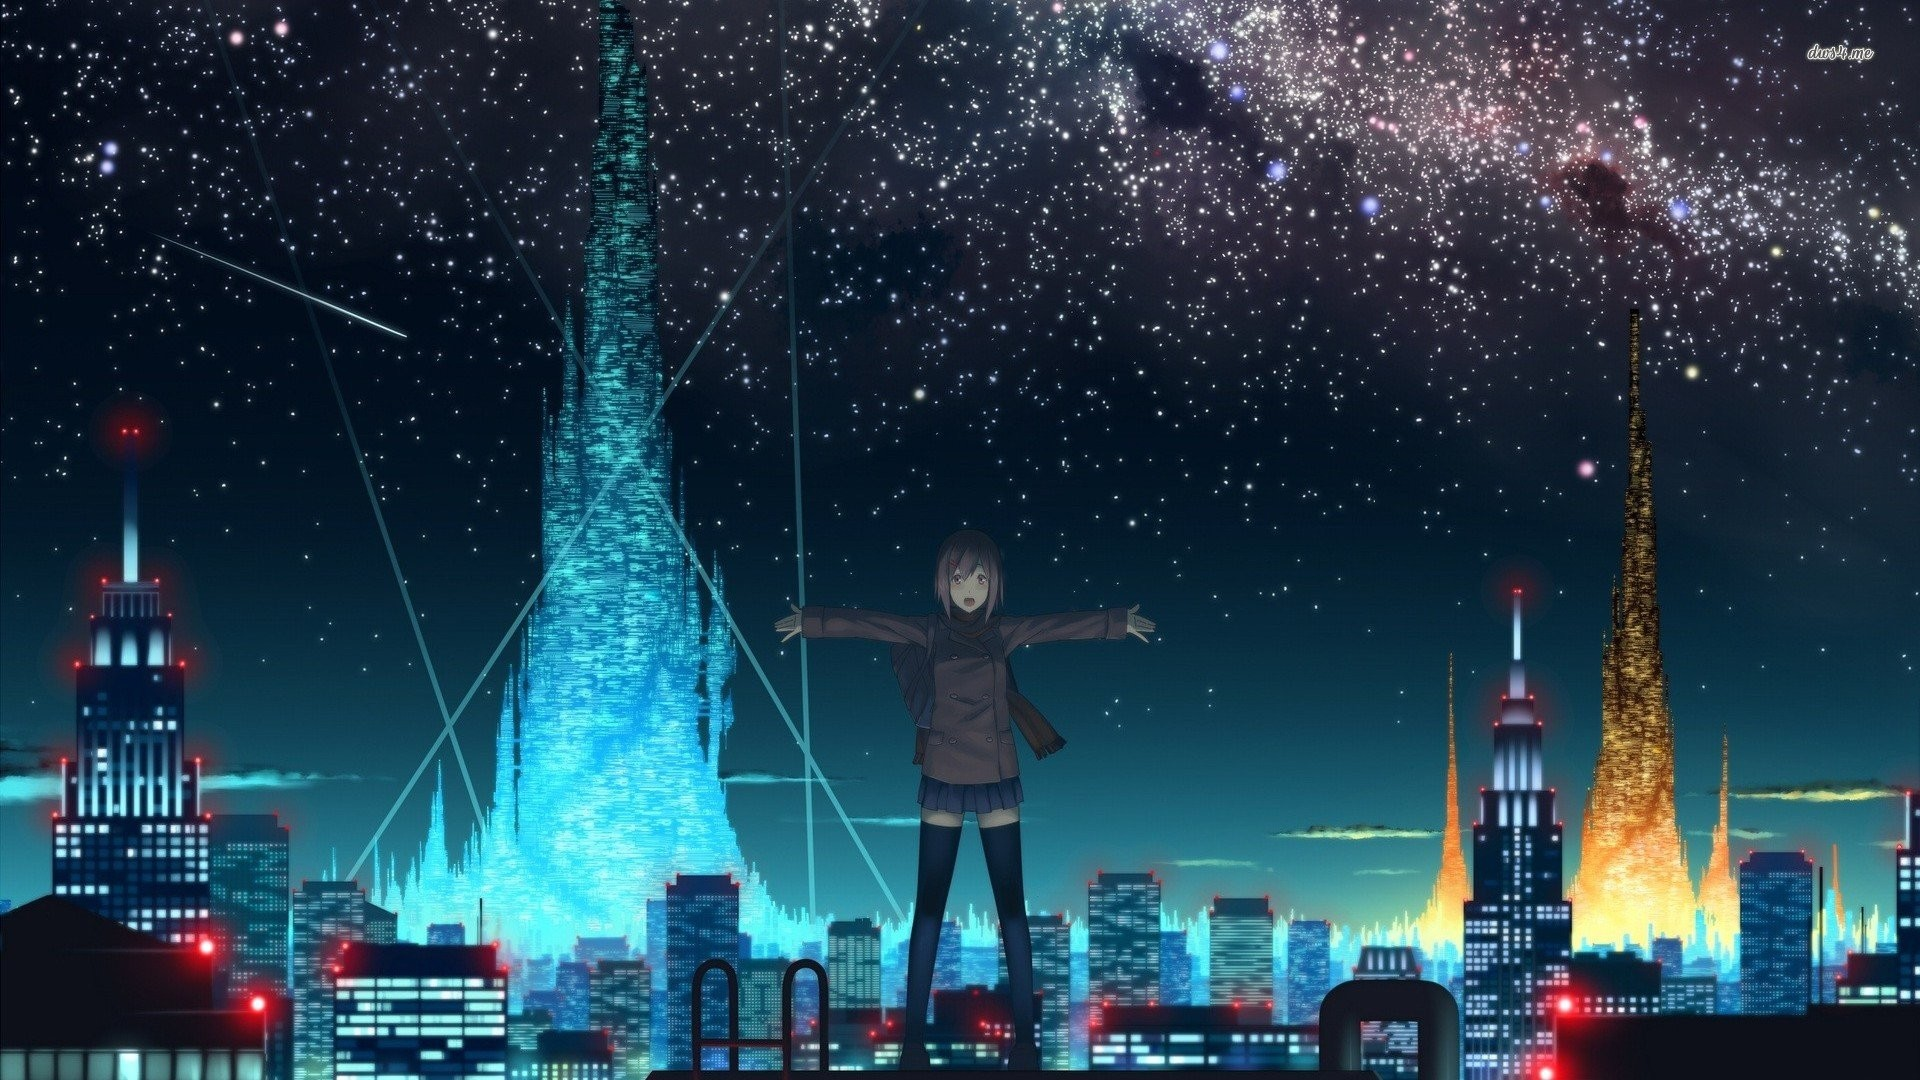 Starry Sky Over Anime City 532288 …